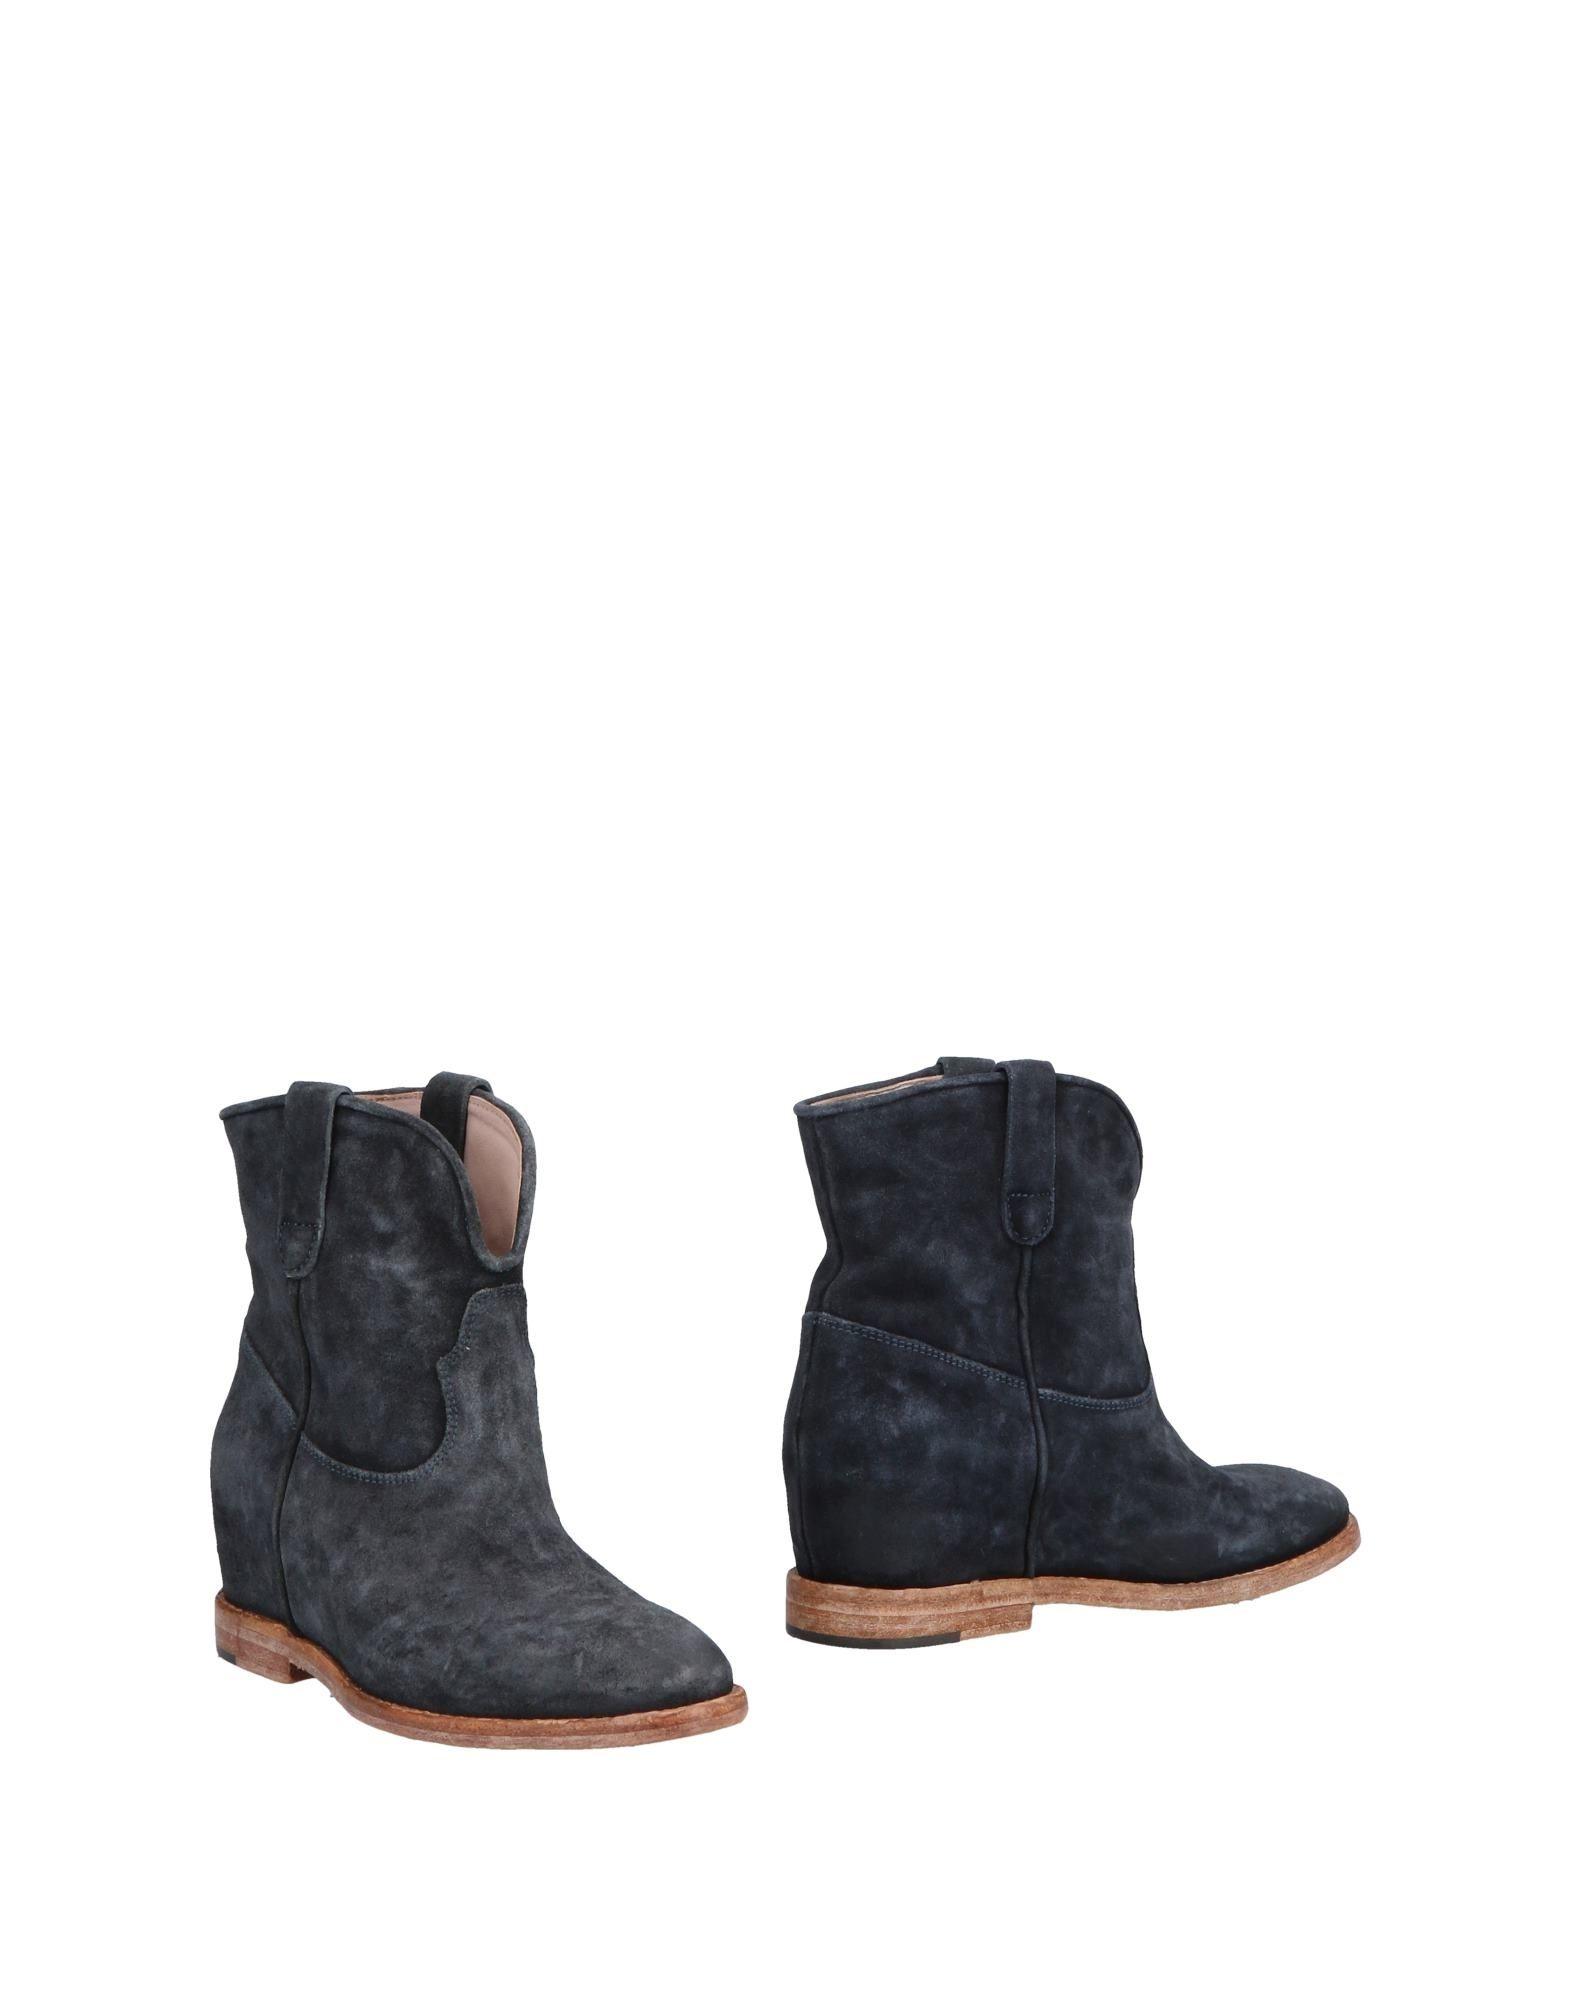 CORVARI Ankle Boot in Dark Blue